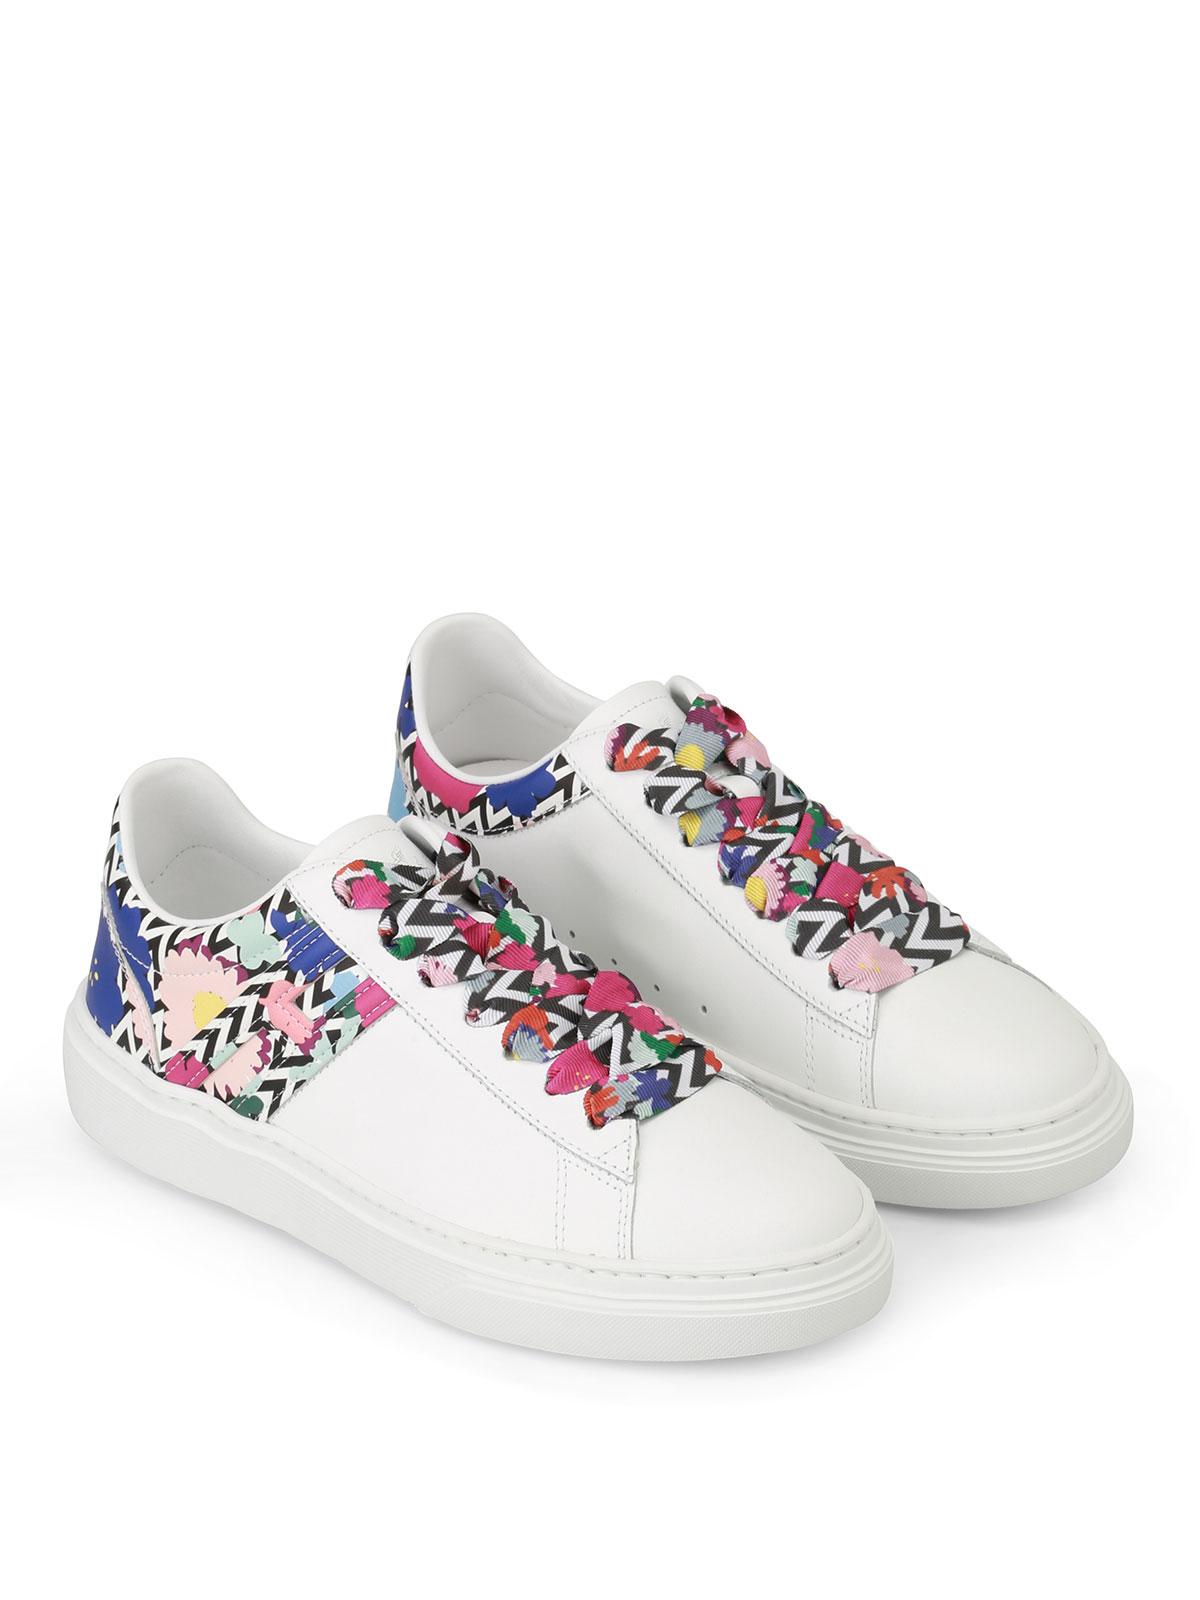 Hogan - H365 colourful details sneakers